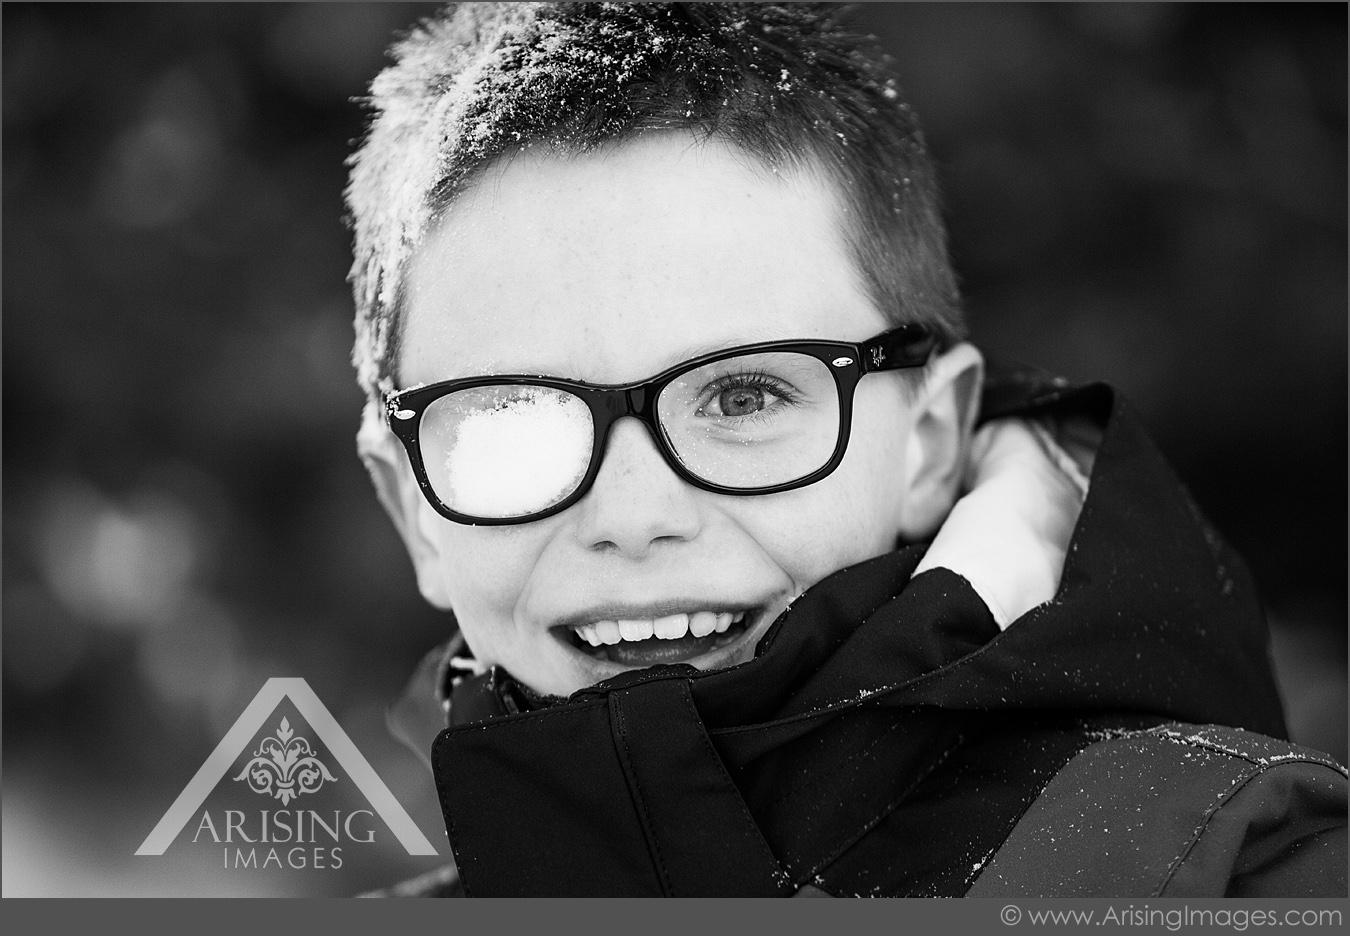 michigan-winter-kids-pictures-8